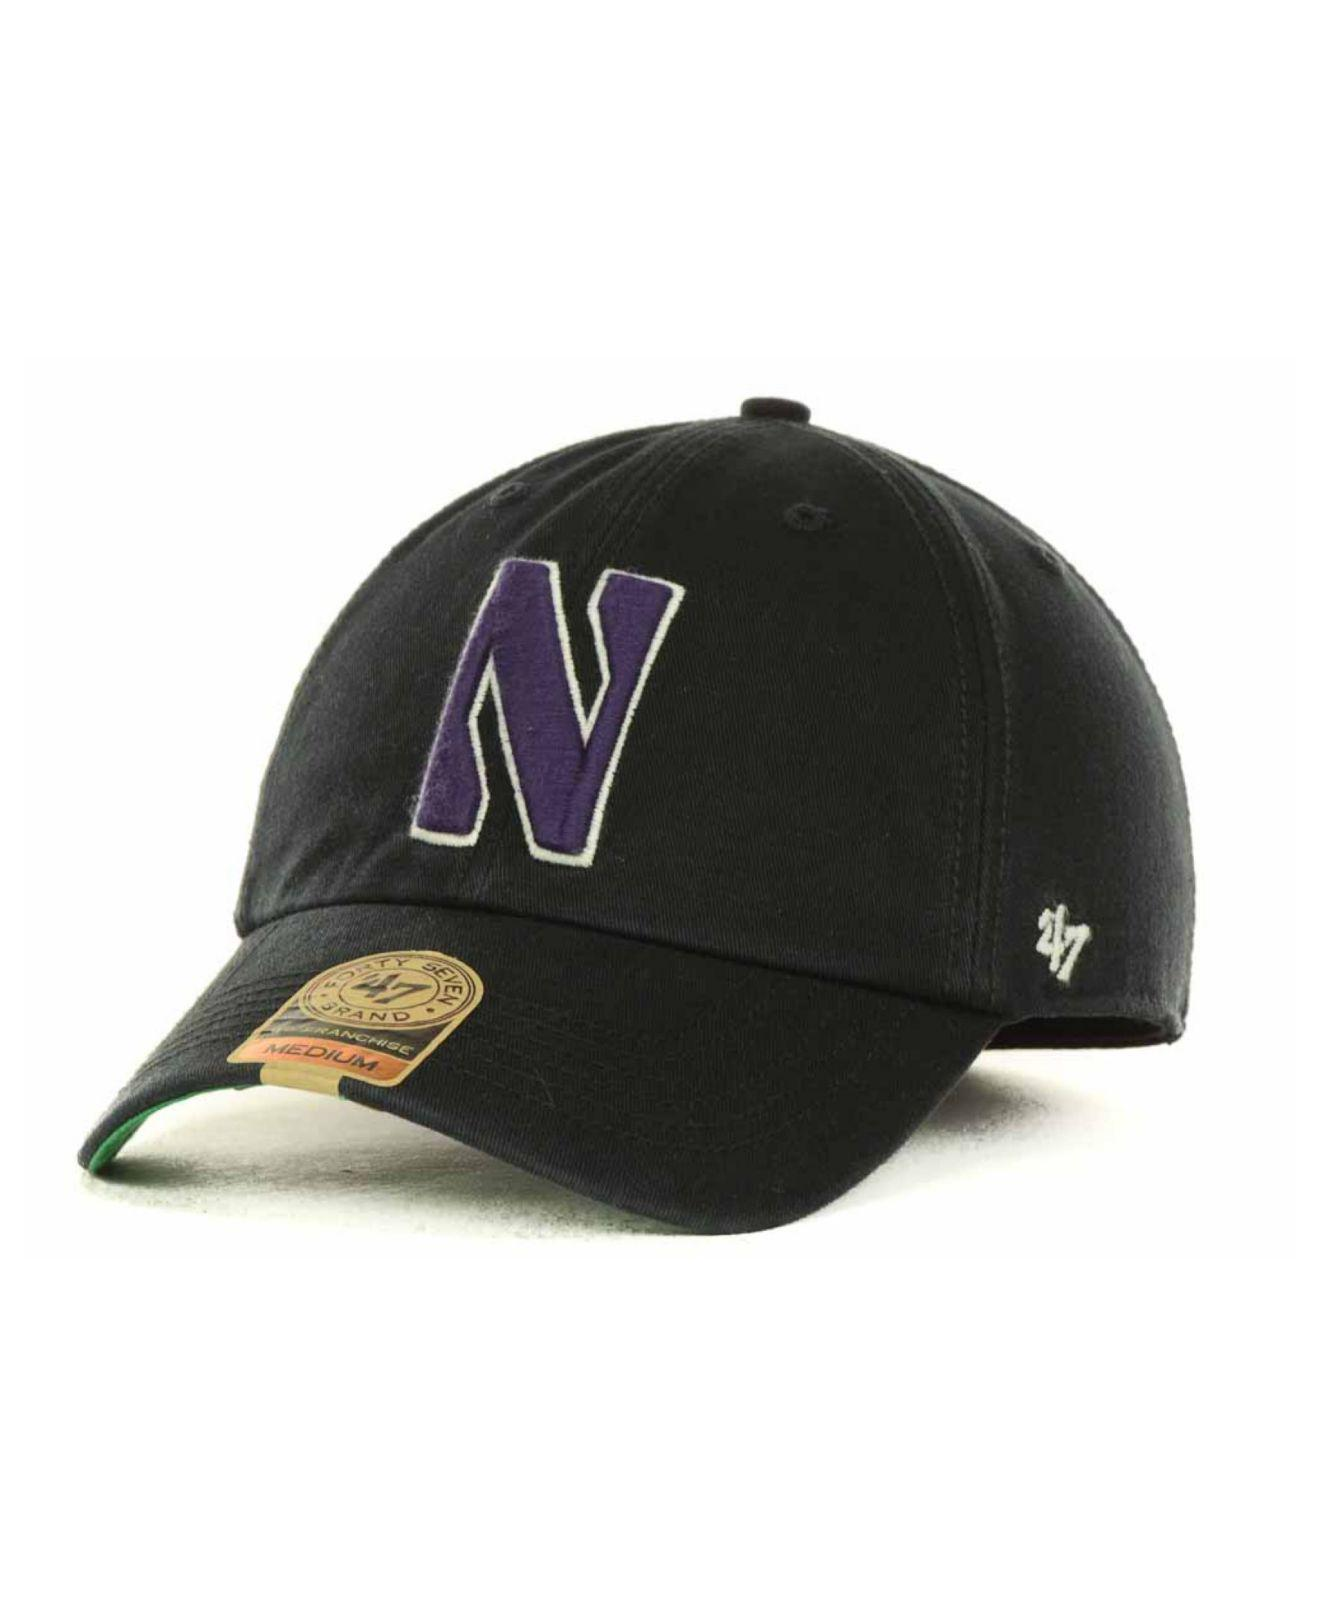 Lyst - 47 Brand Northwestern Wildcats Franchise Cap in Black for Men 0b3aa9f6e777